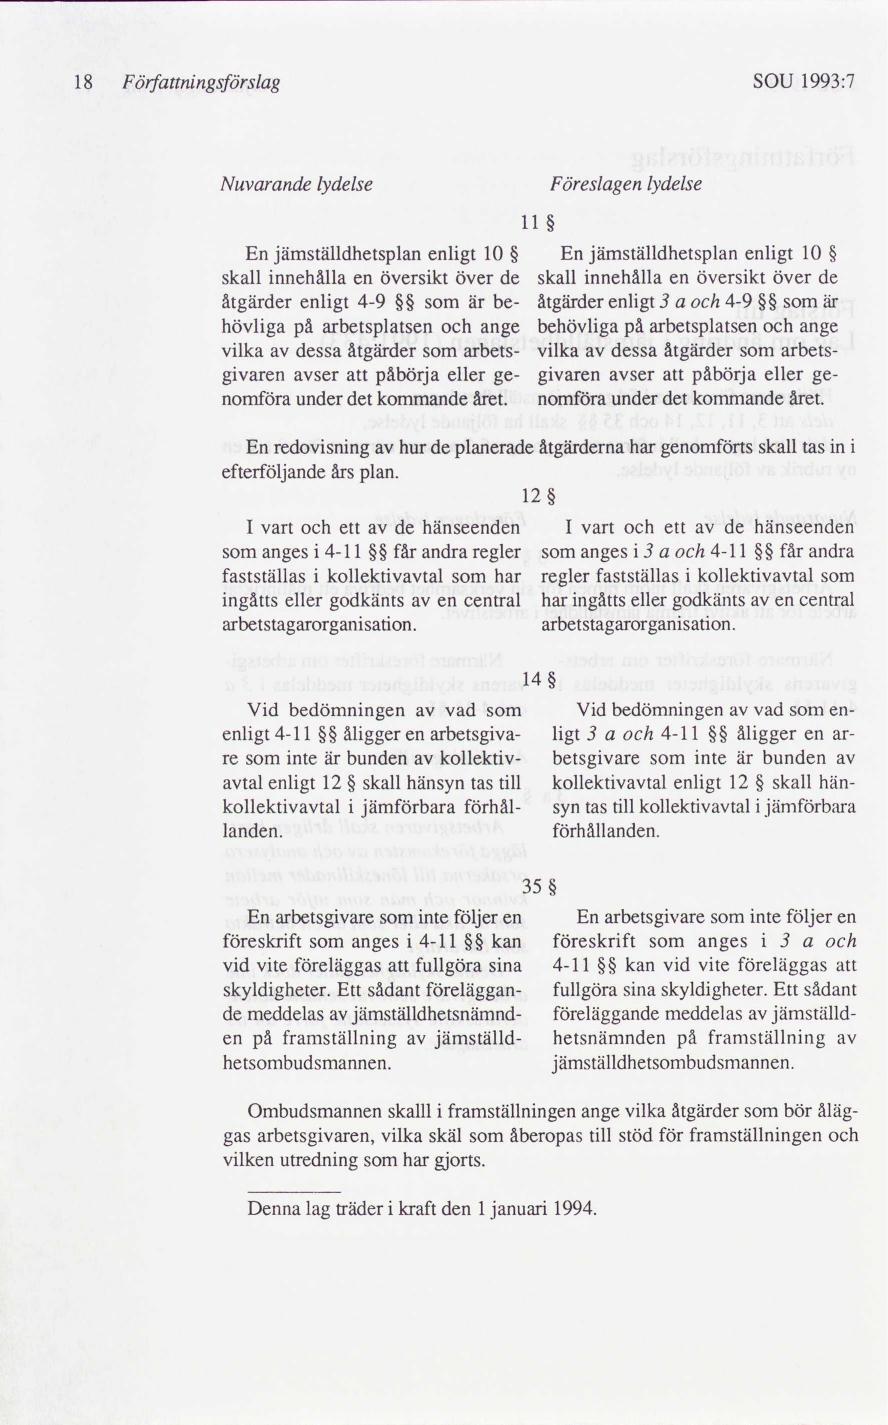 Bakslag for do i arbetsdomstolen 3